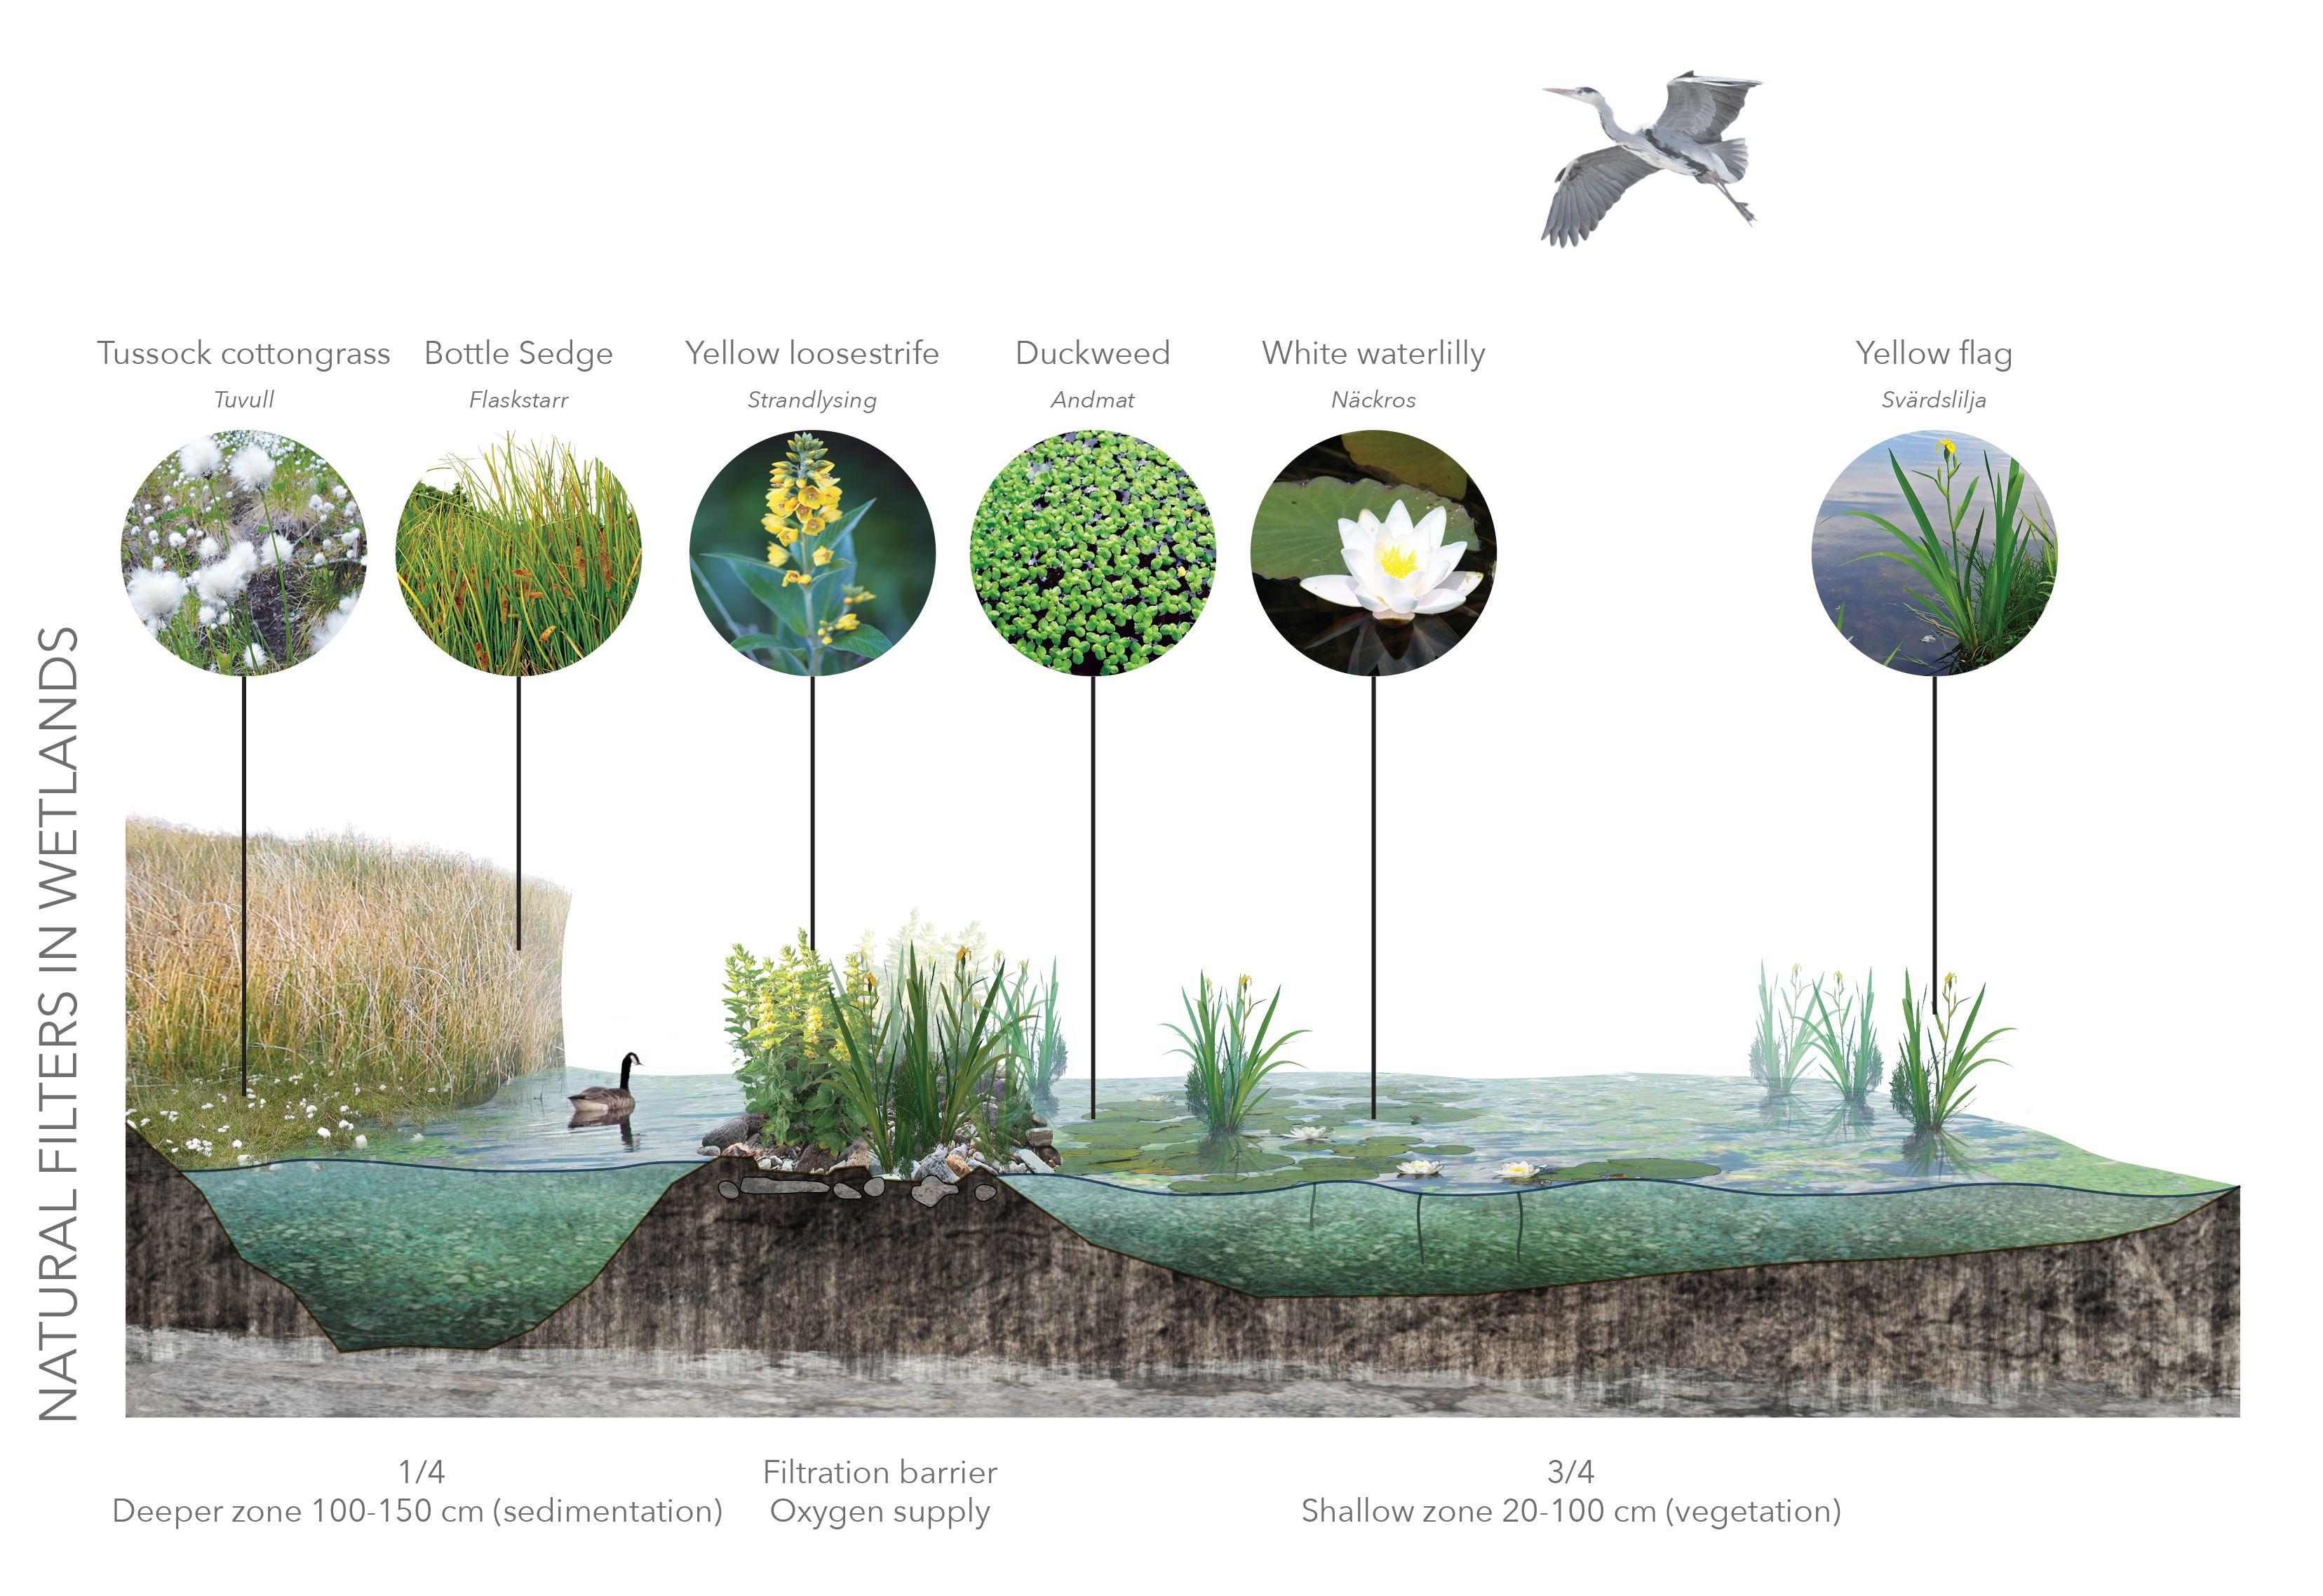 1000 Images About Landscape Representation On Pinterest